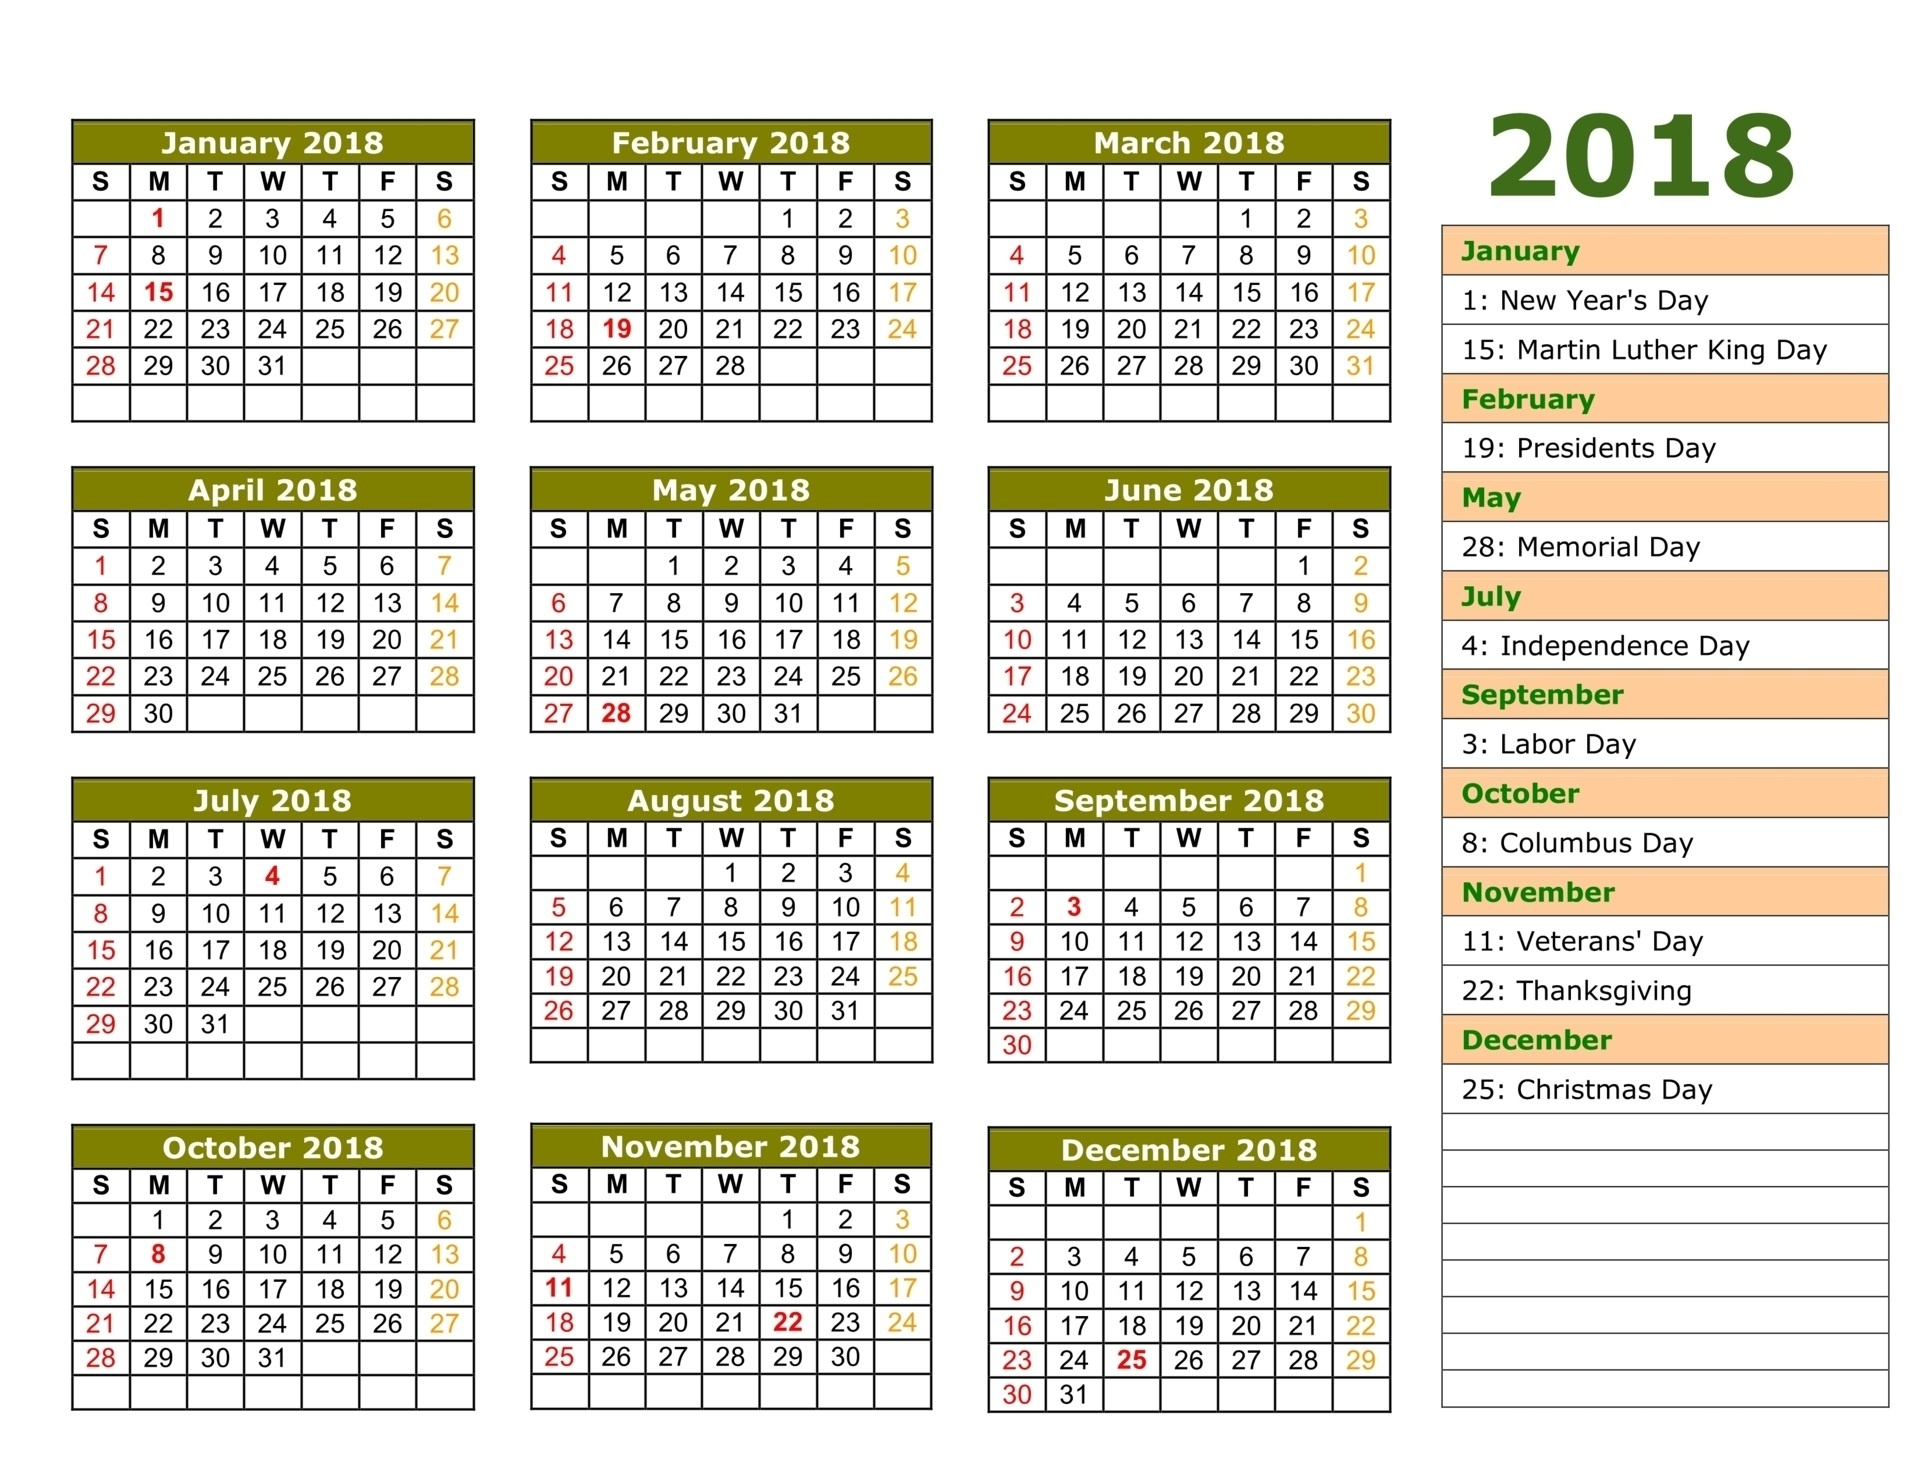 Islamic Calendar 2018 | Hijri Calendar 1439 | Free Printable  Urdu Calendar Of Year 2000 Month December